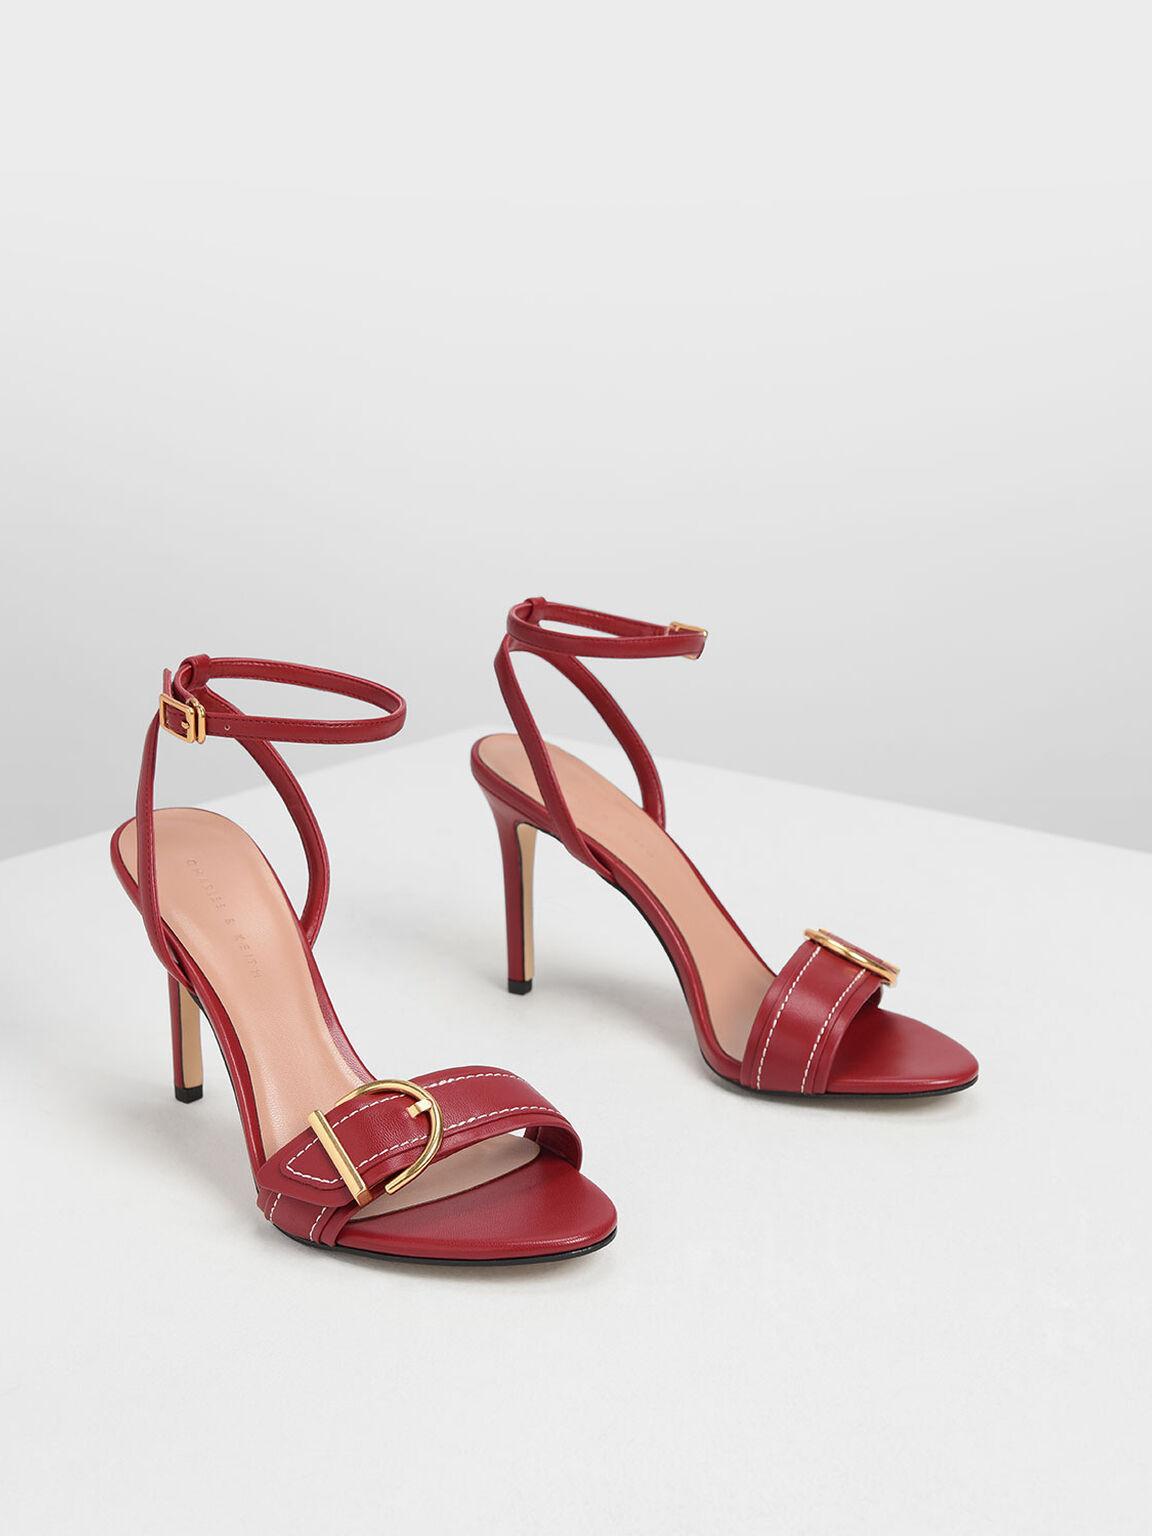 Buckle Ankle Strap Heels, Red, hi-res